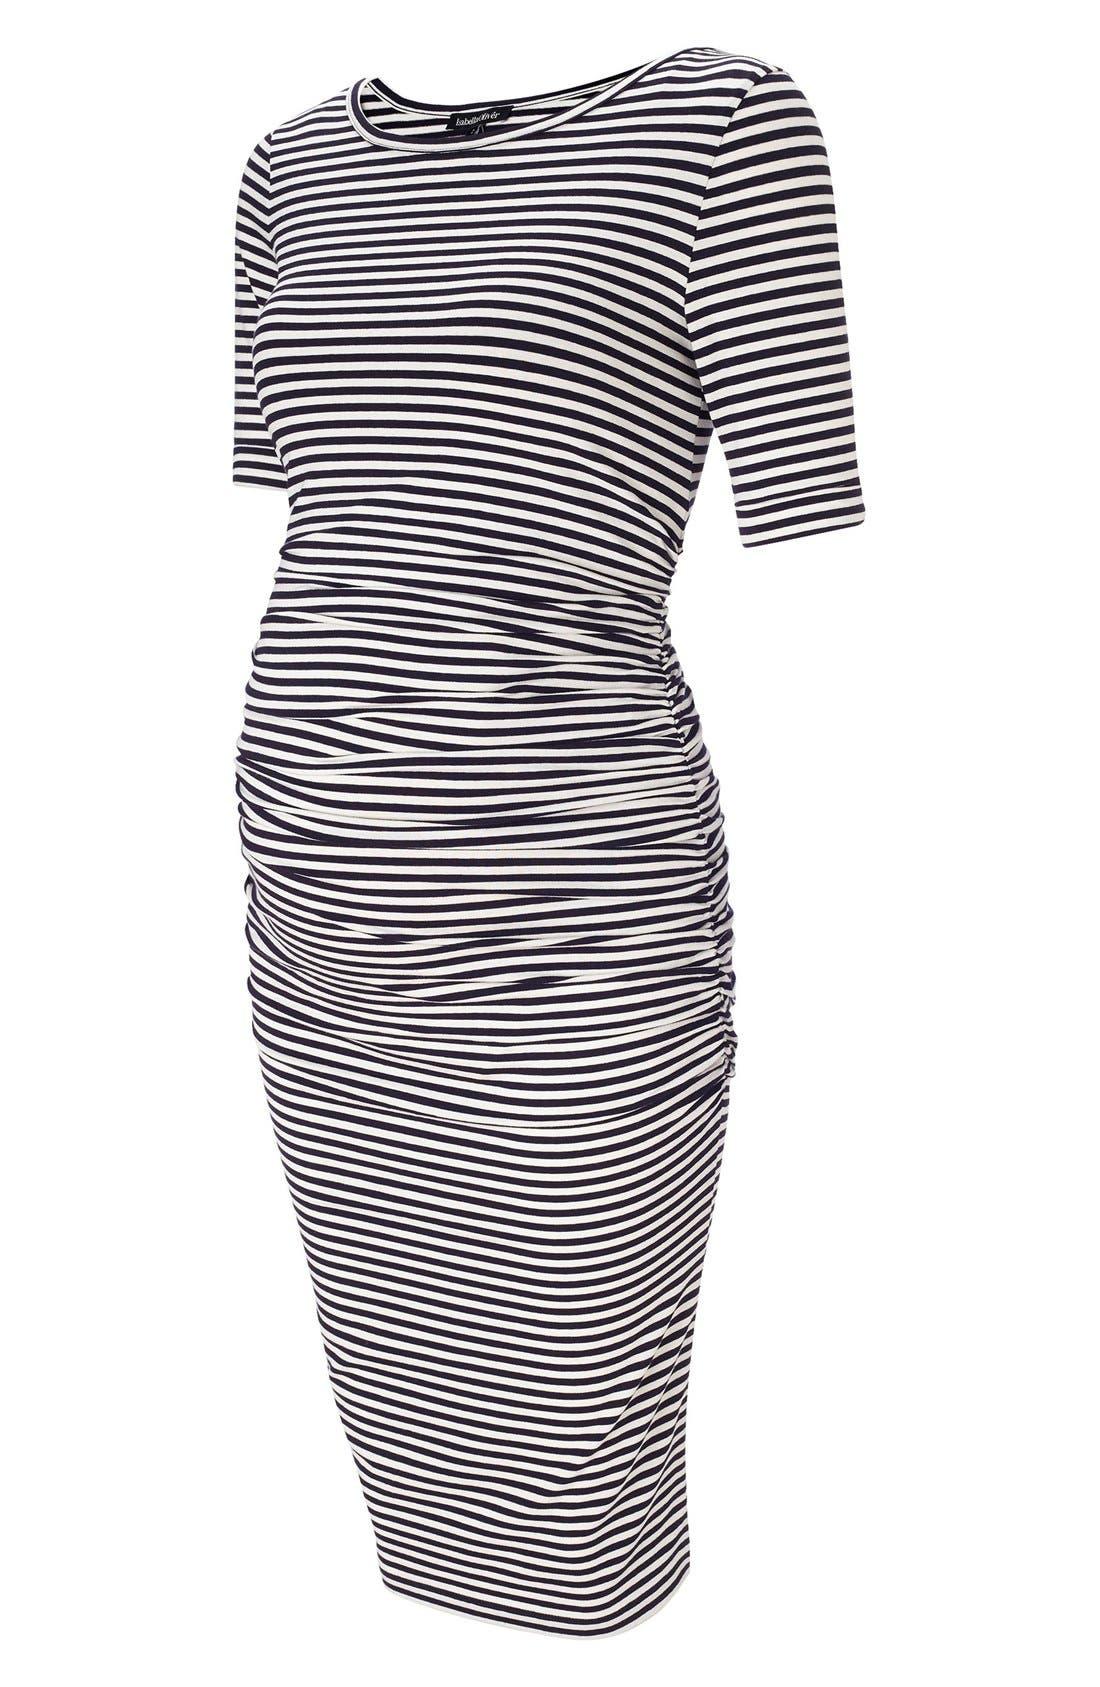 Arlington Stripe Maternity Dress,                         Main,                         color, 410